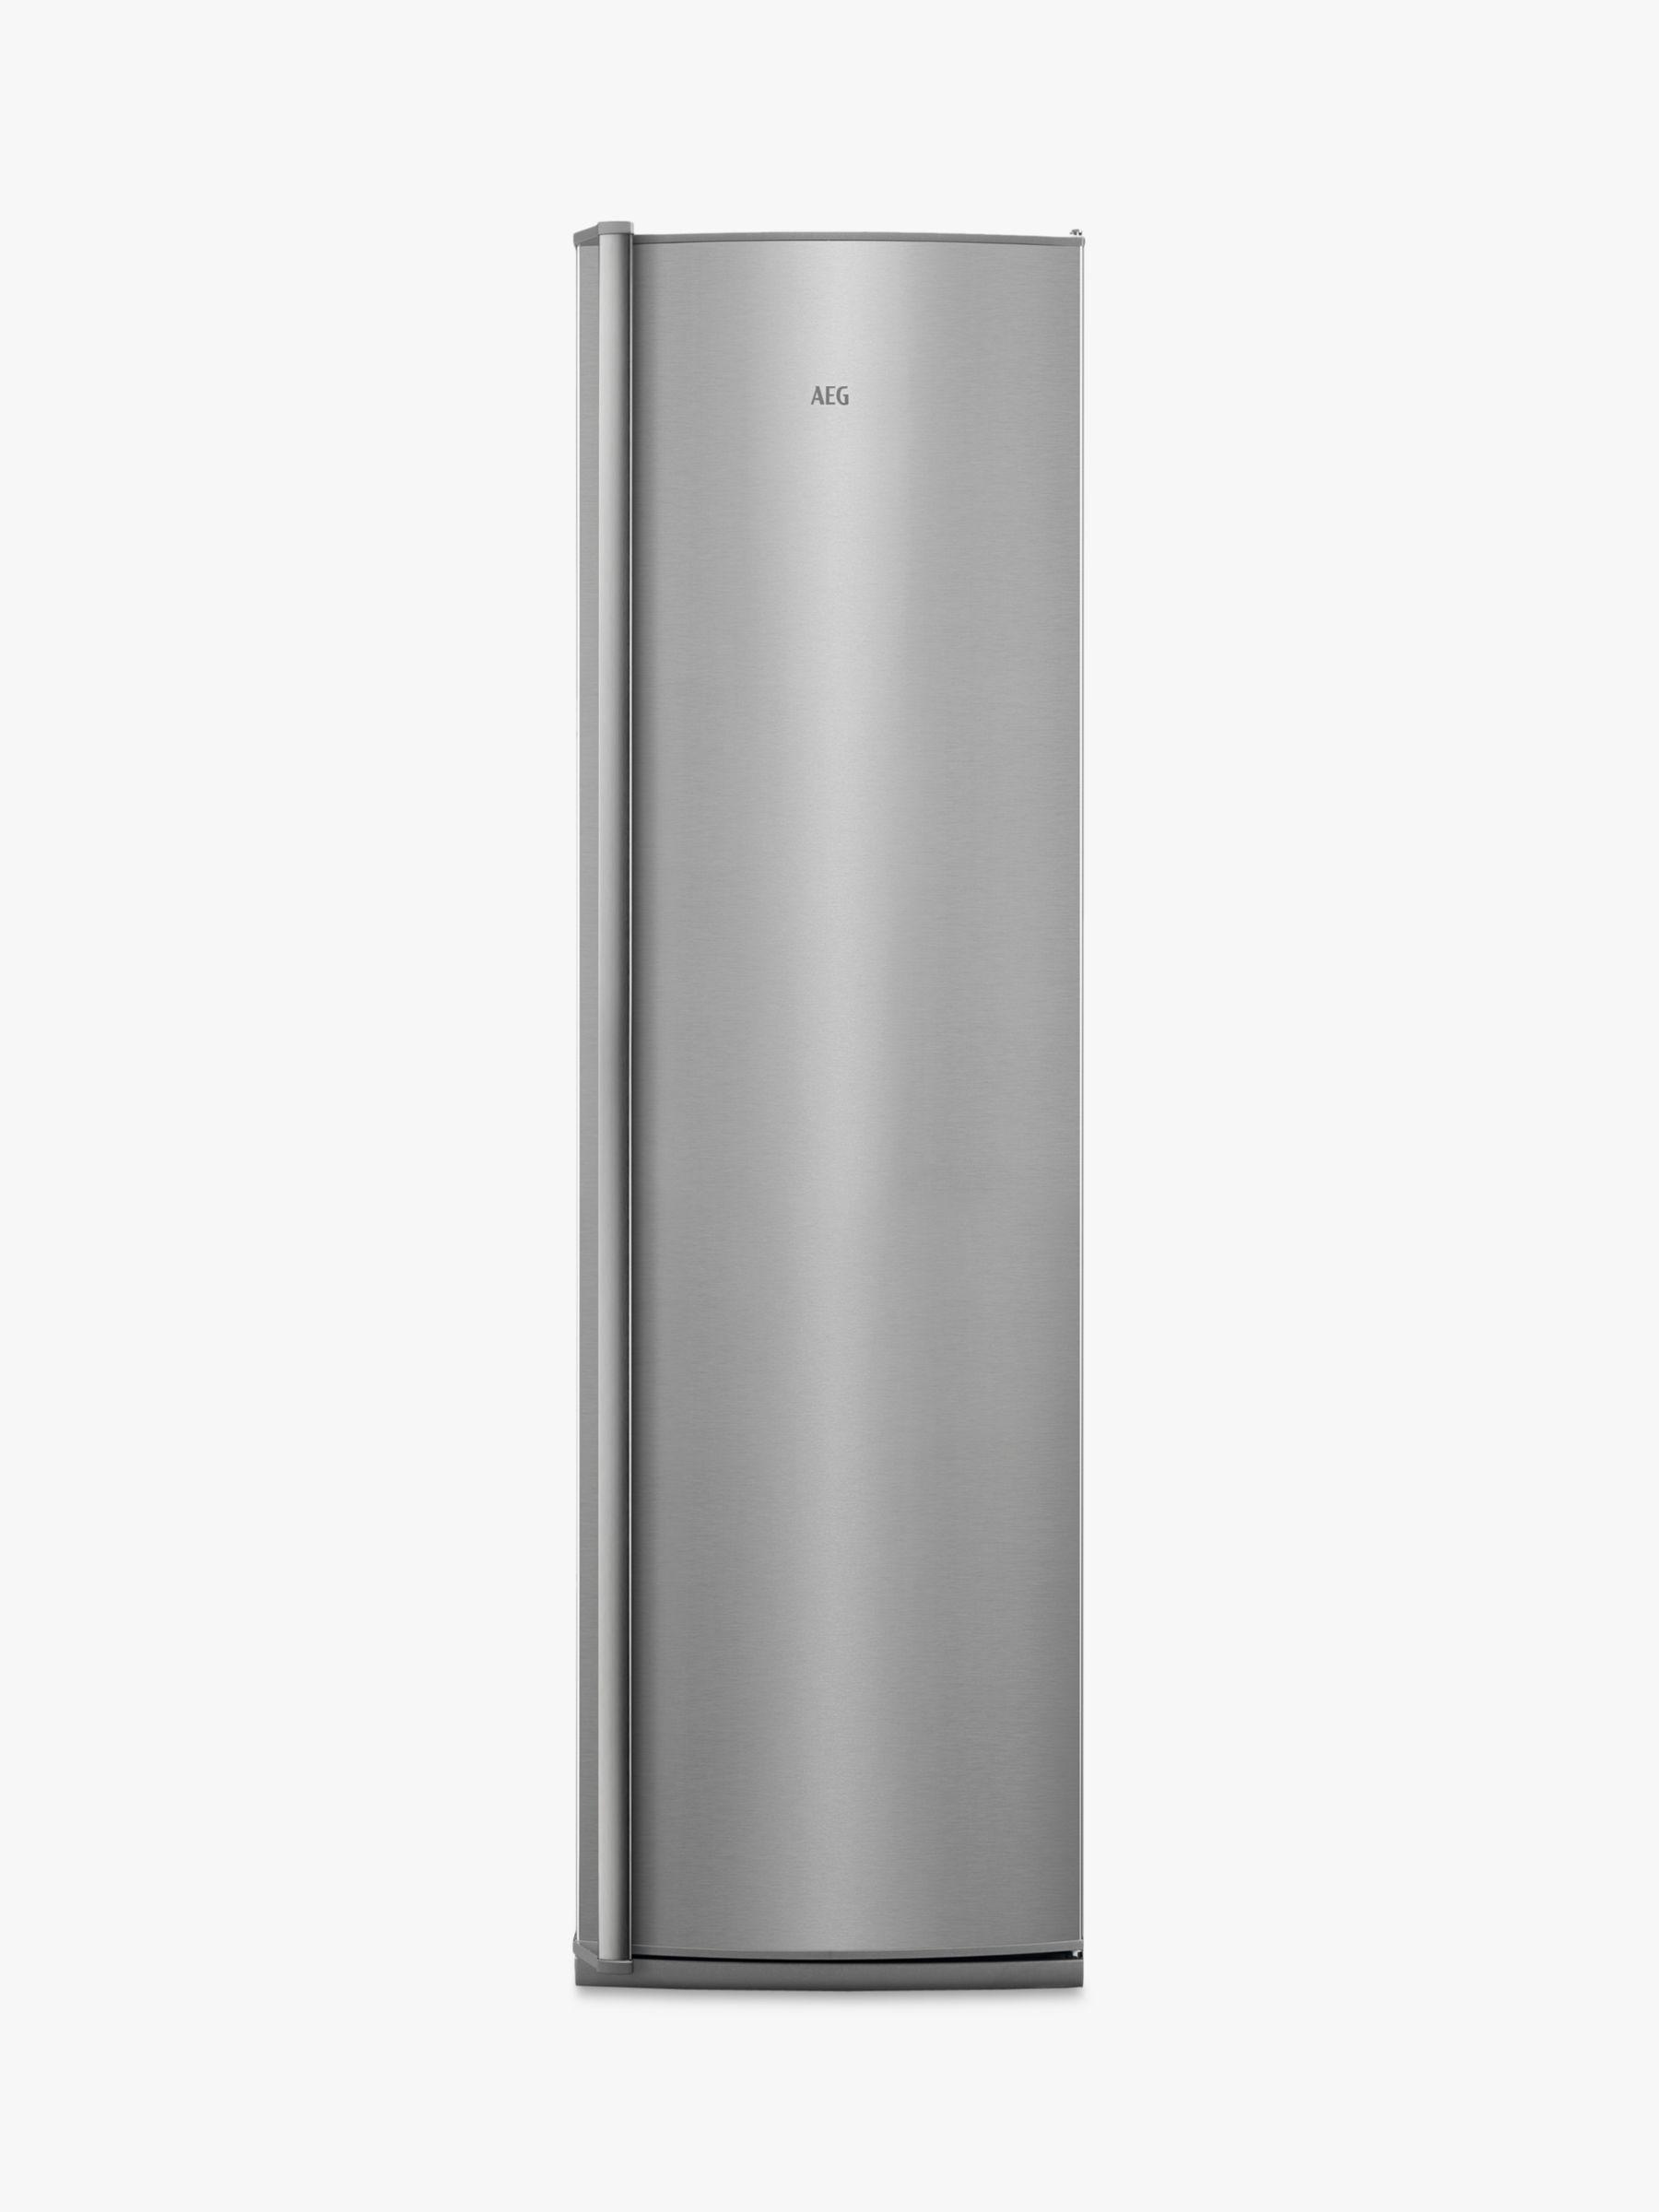 AEG AEG AGB62226NX Tall Freezer, A++ Energy Rating, 59.5cm Wide, Silver